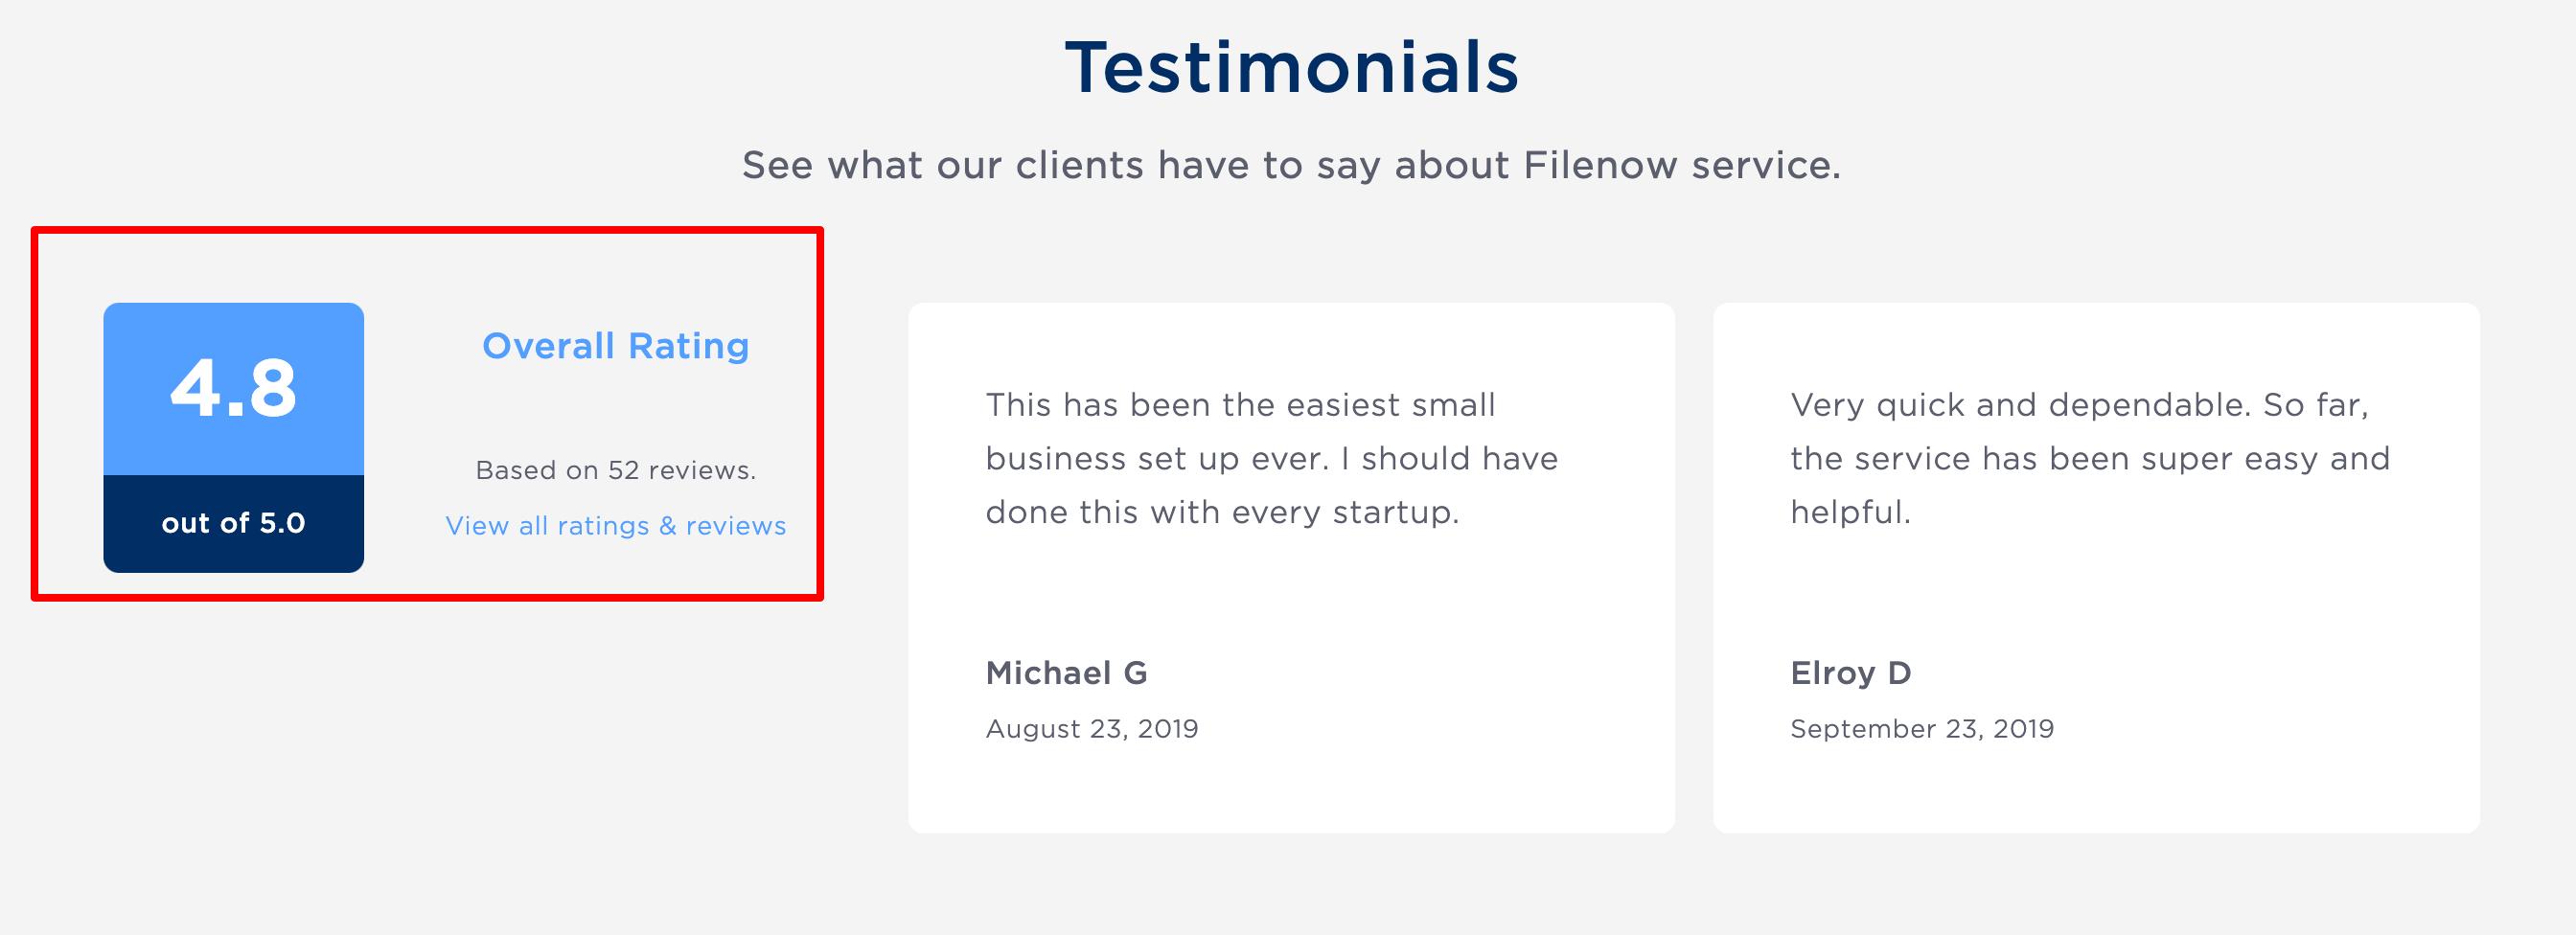 Filenow- Customer Testimonials